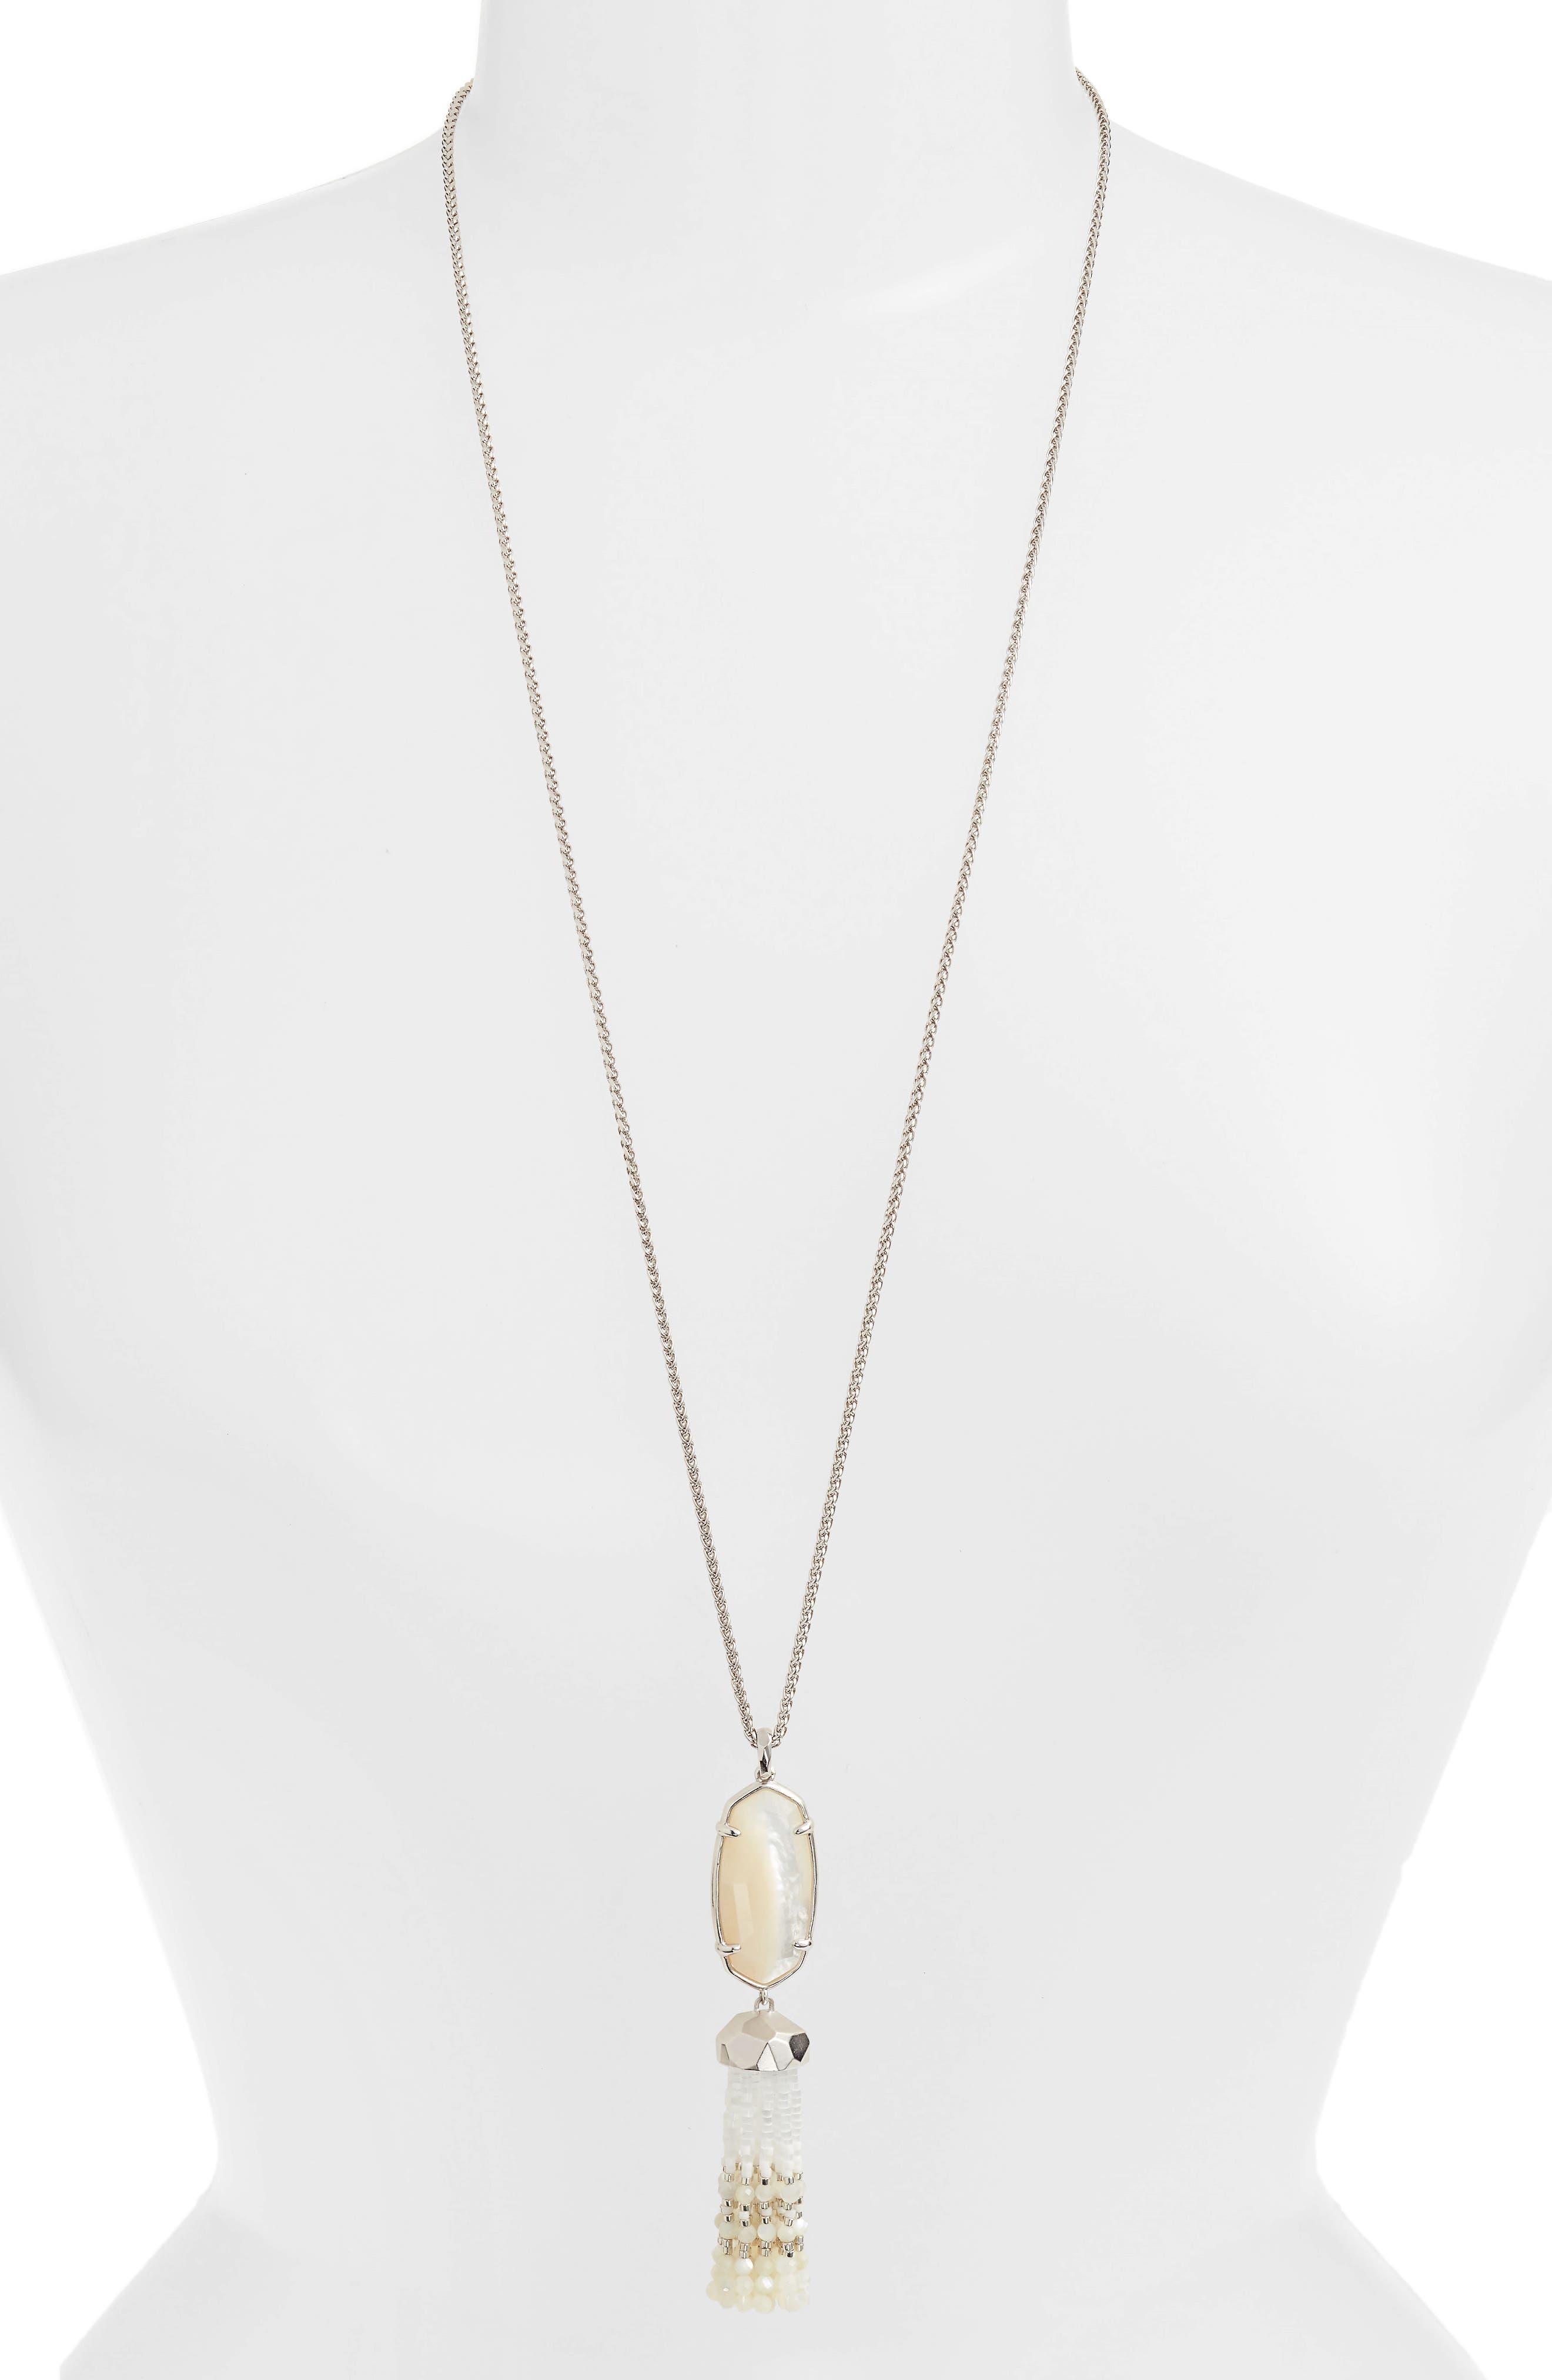 Eva Tassel Pendant Necklace,                         Main,                         color, Ivory Mop/ Silver